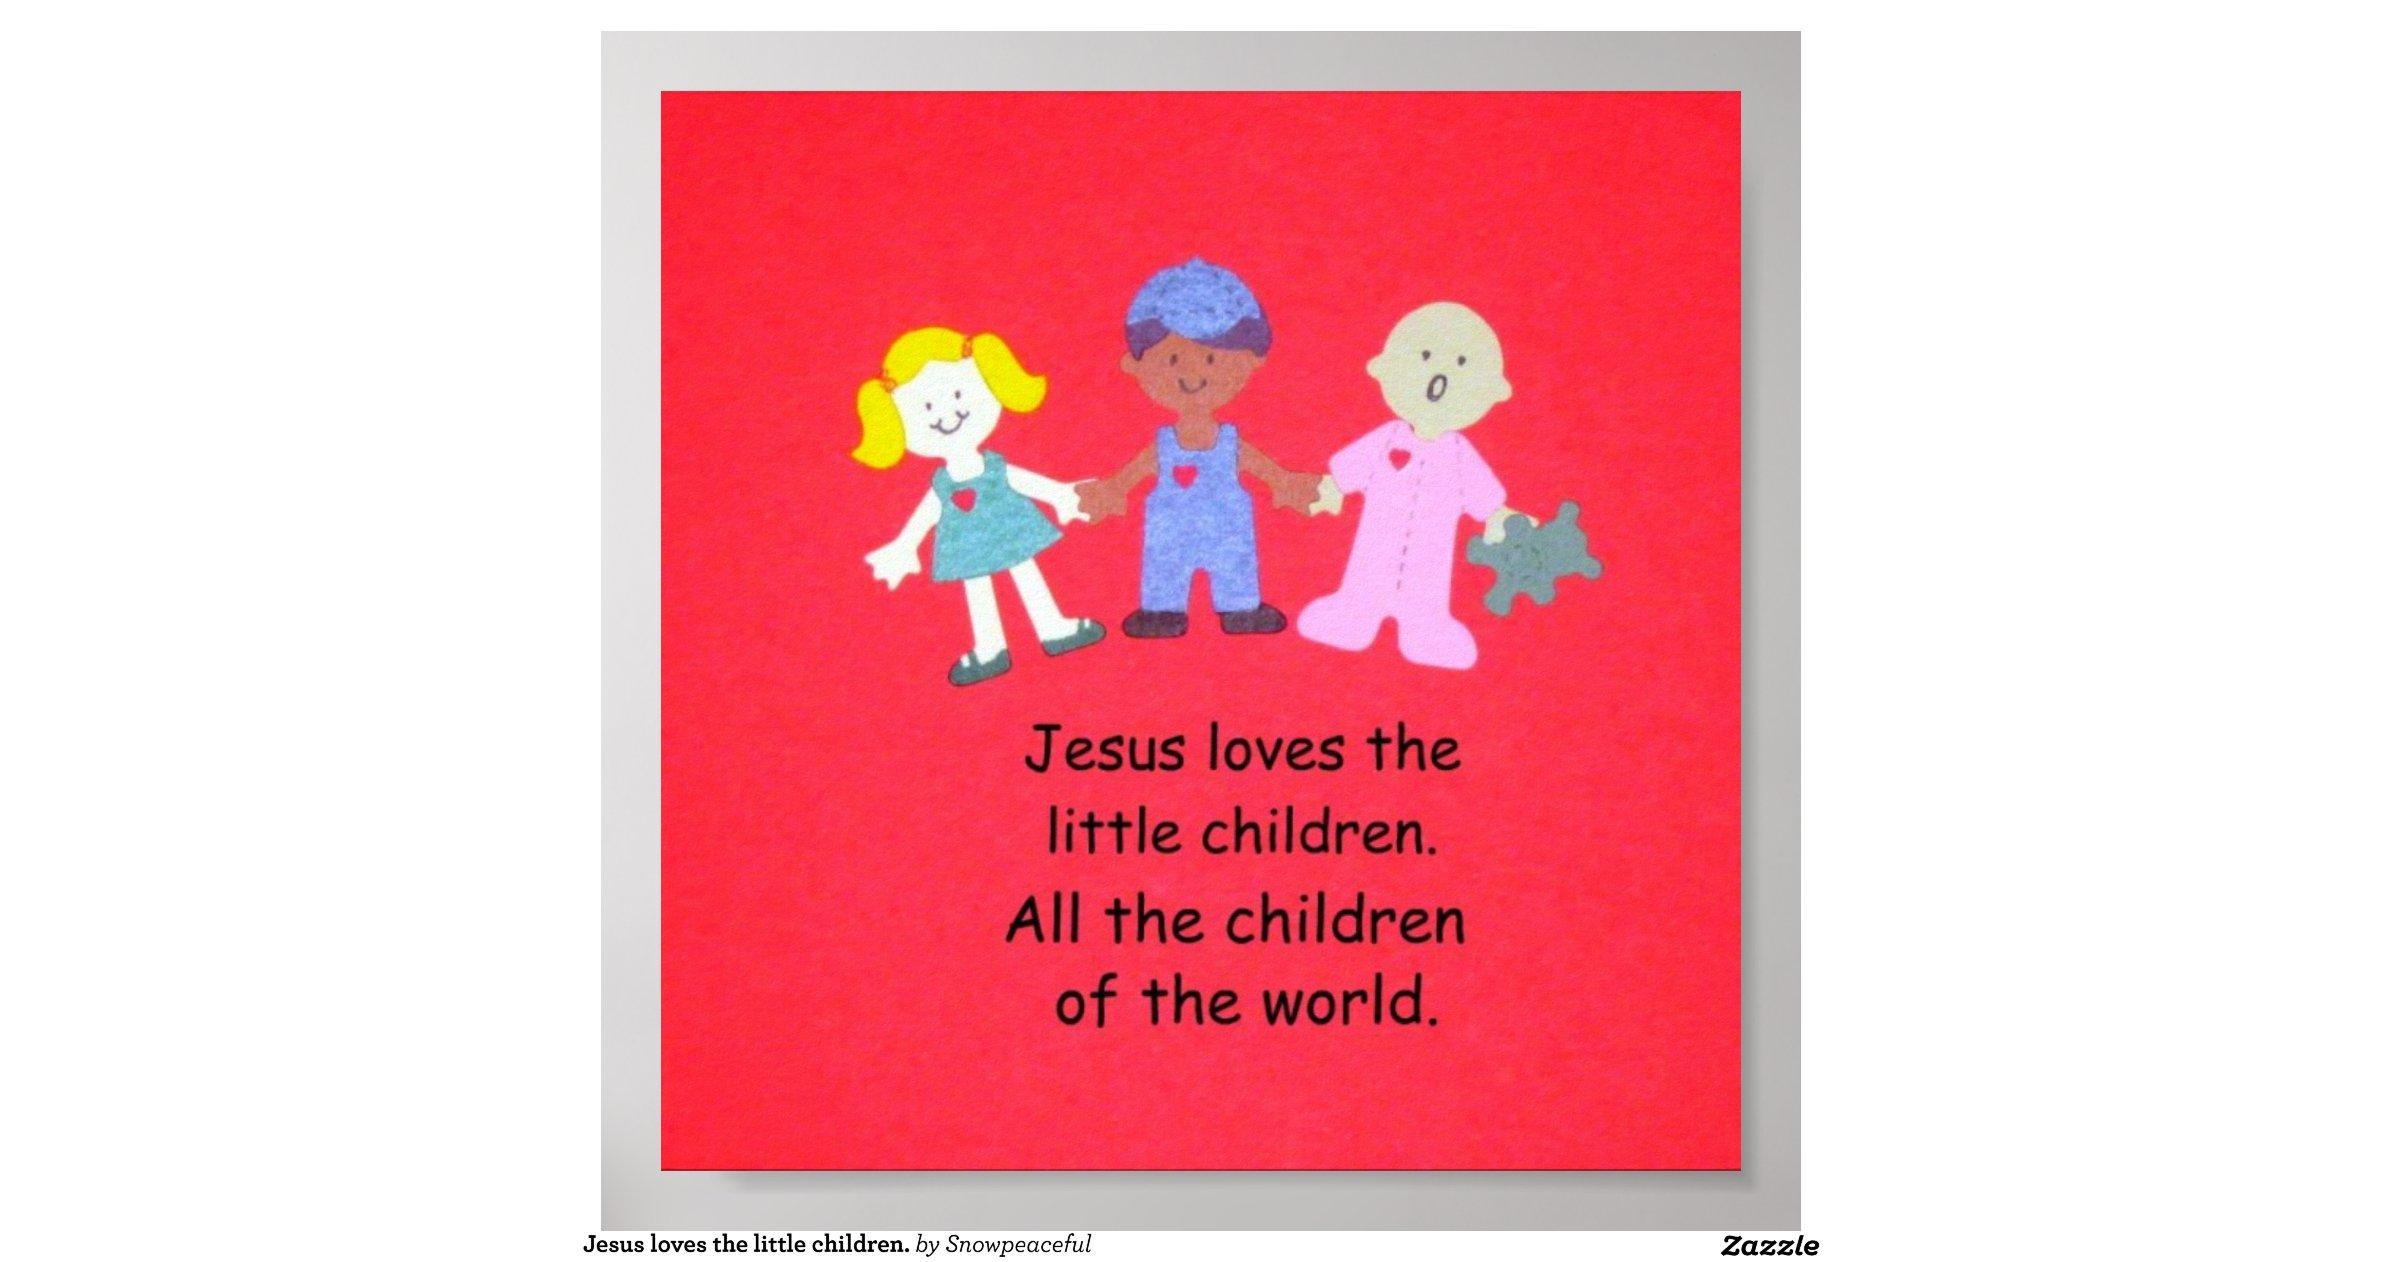 Jesus Loves The Little Children Poster R30a397b0f1e84089b1daf7fd3ae5e3dd Wi4 8byvr 1200view